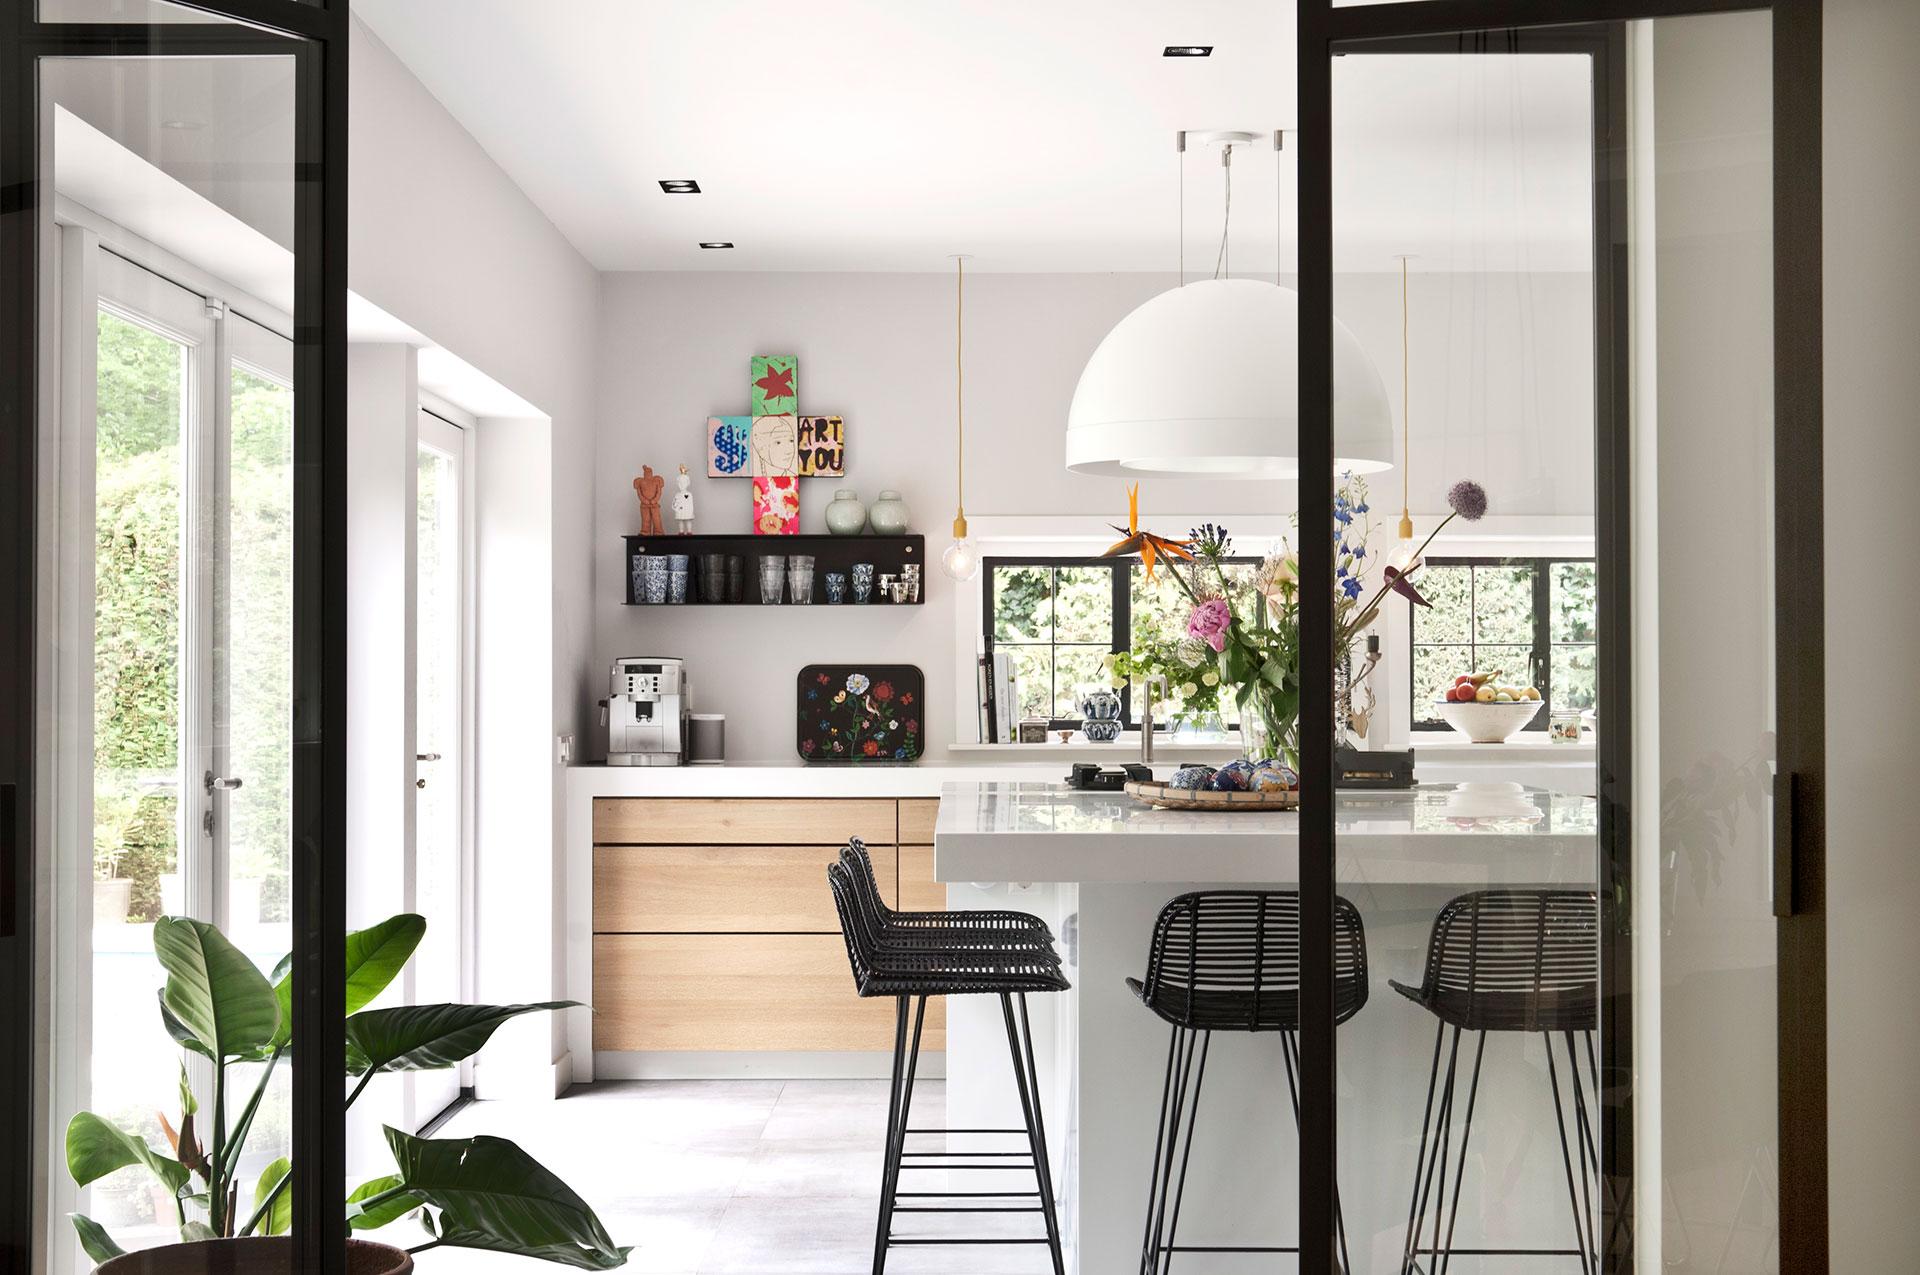 Vtwonen Keuken Houten : Vt wonen keuken wit waanzinnig wit wonen droomhome interieur